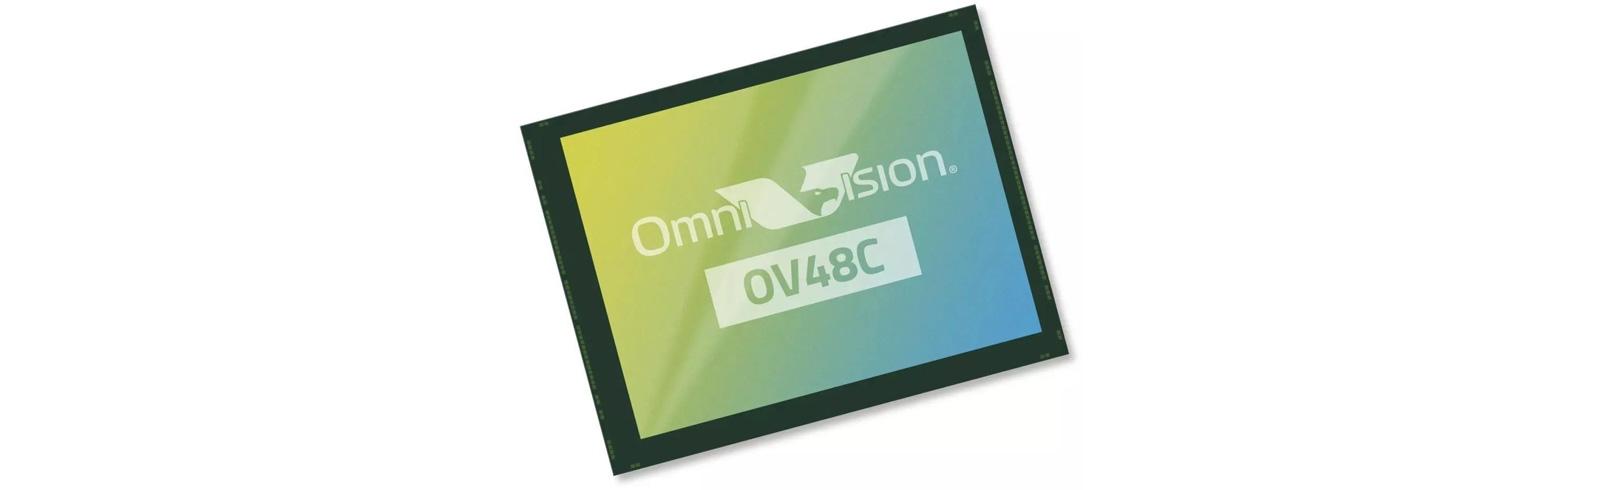 Xiaomi Mi 10 Ultra is using an OmniVision OV48C sensor for its main 48MP camera